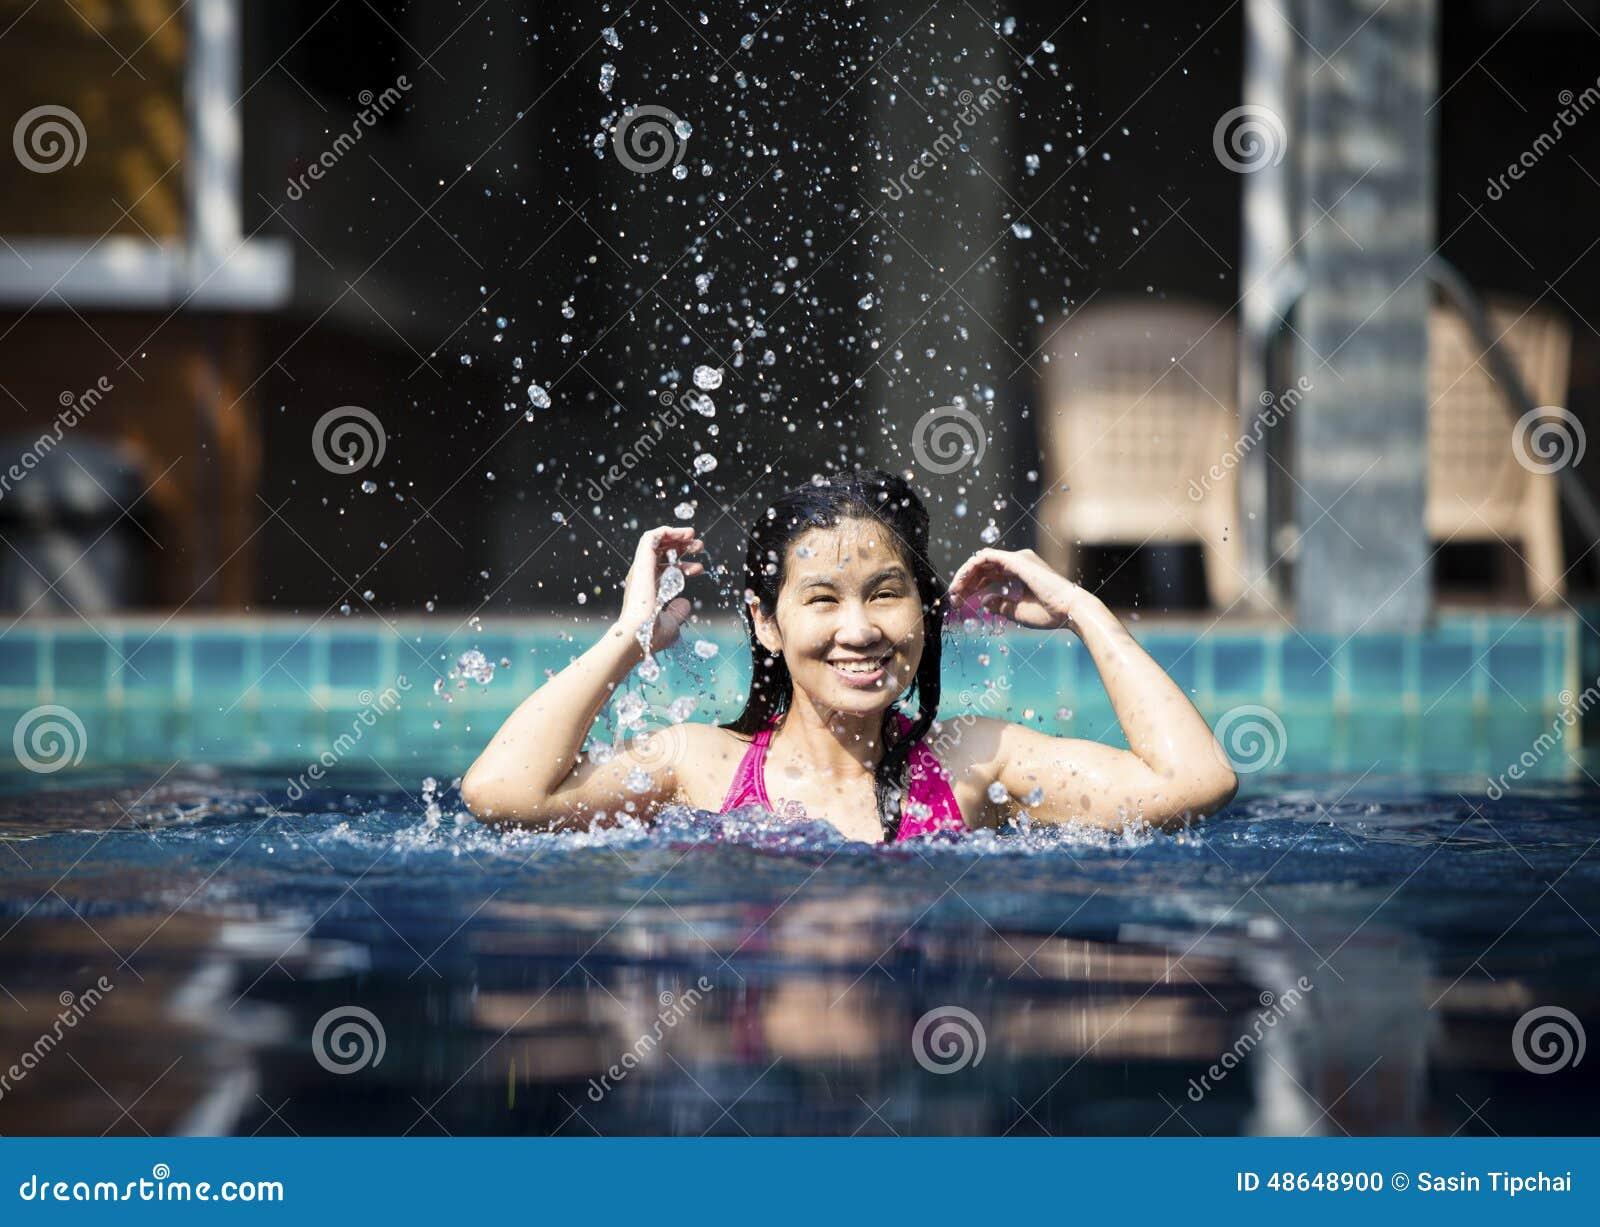 Girl In Swimming Pool Stock Photo Image 48648900